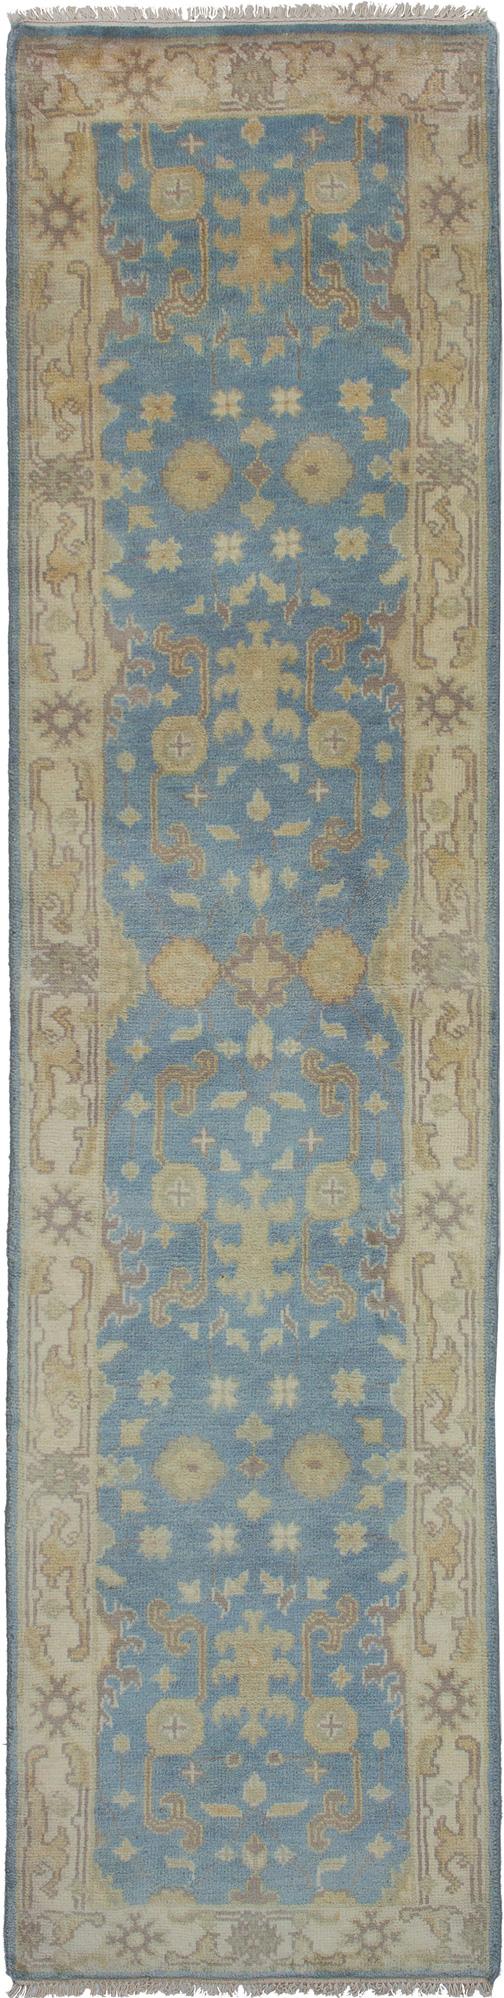 "Hand-knotted Royal Ushak Sky Blue Wool Rug 2'6"" x 10'0"" Size: 2'6"" x 10'0"""